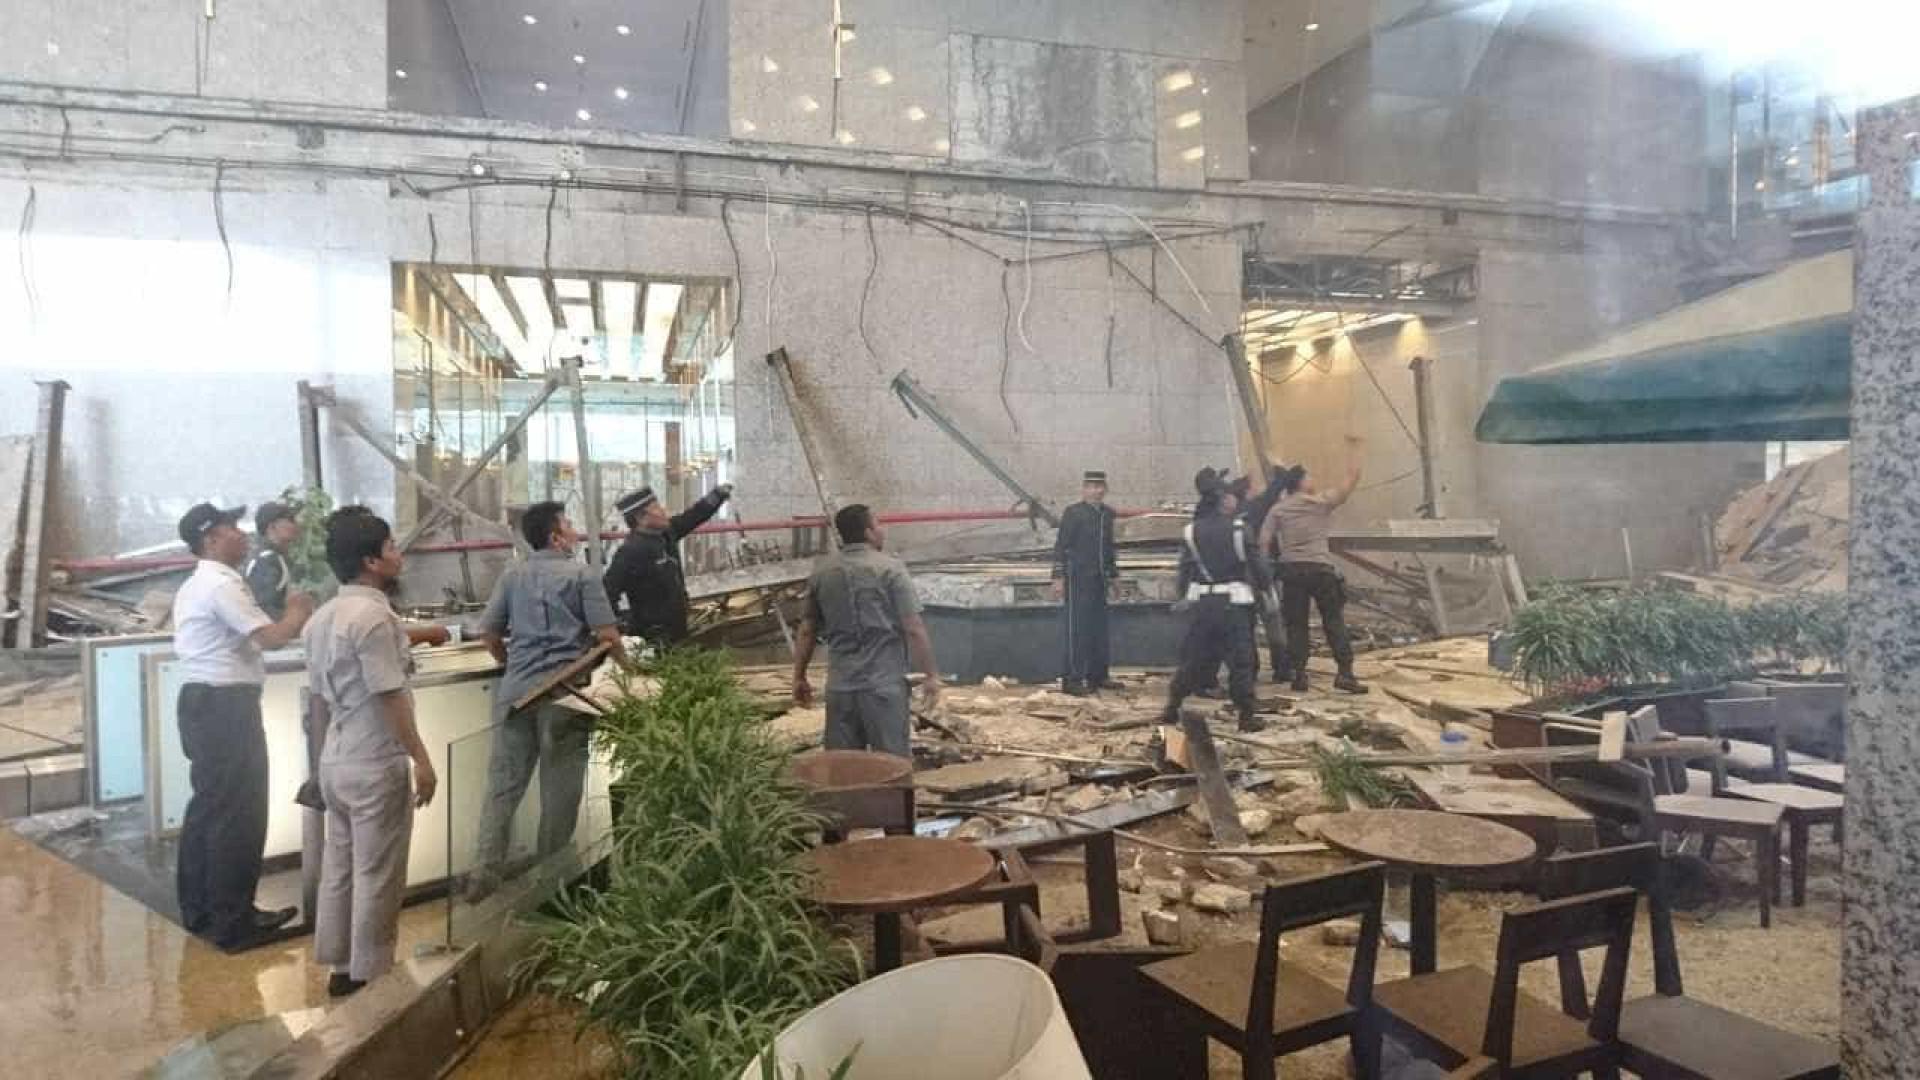 Desmoronamento na bolsa de Jacarta provoca 72 feridos